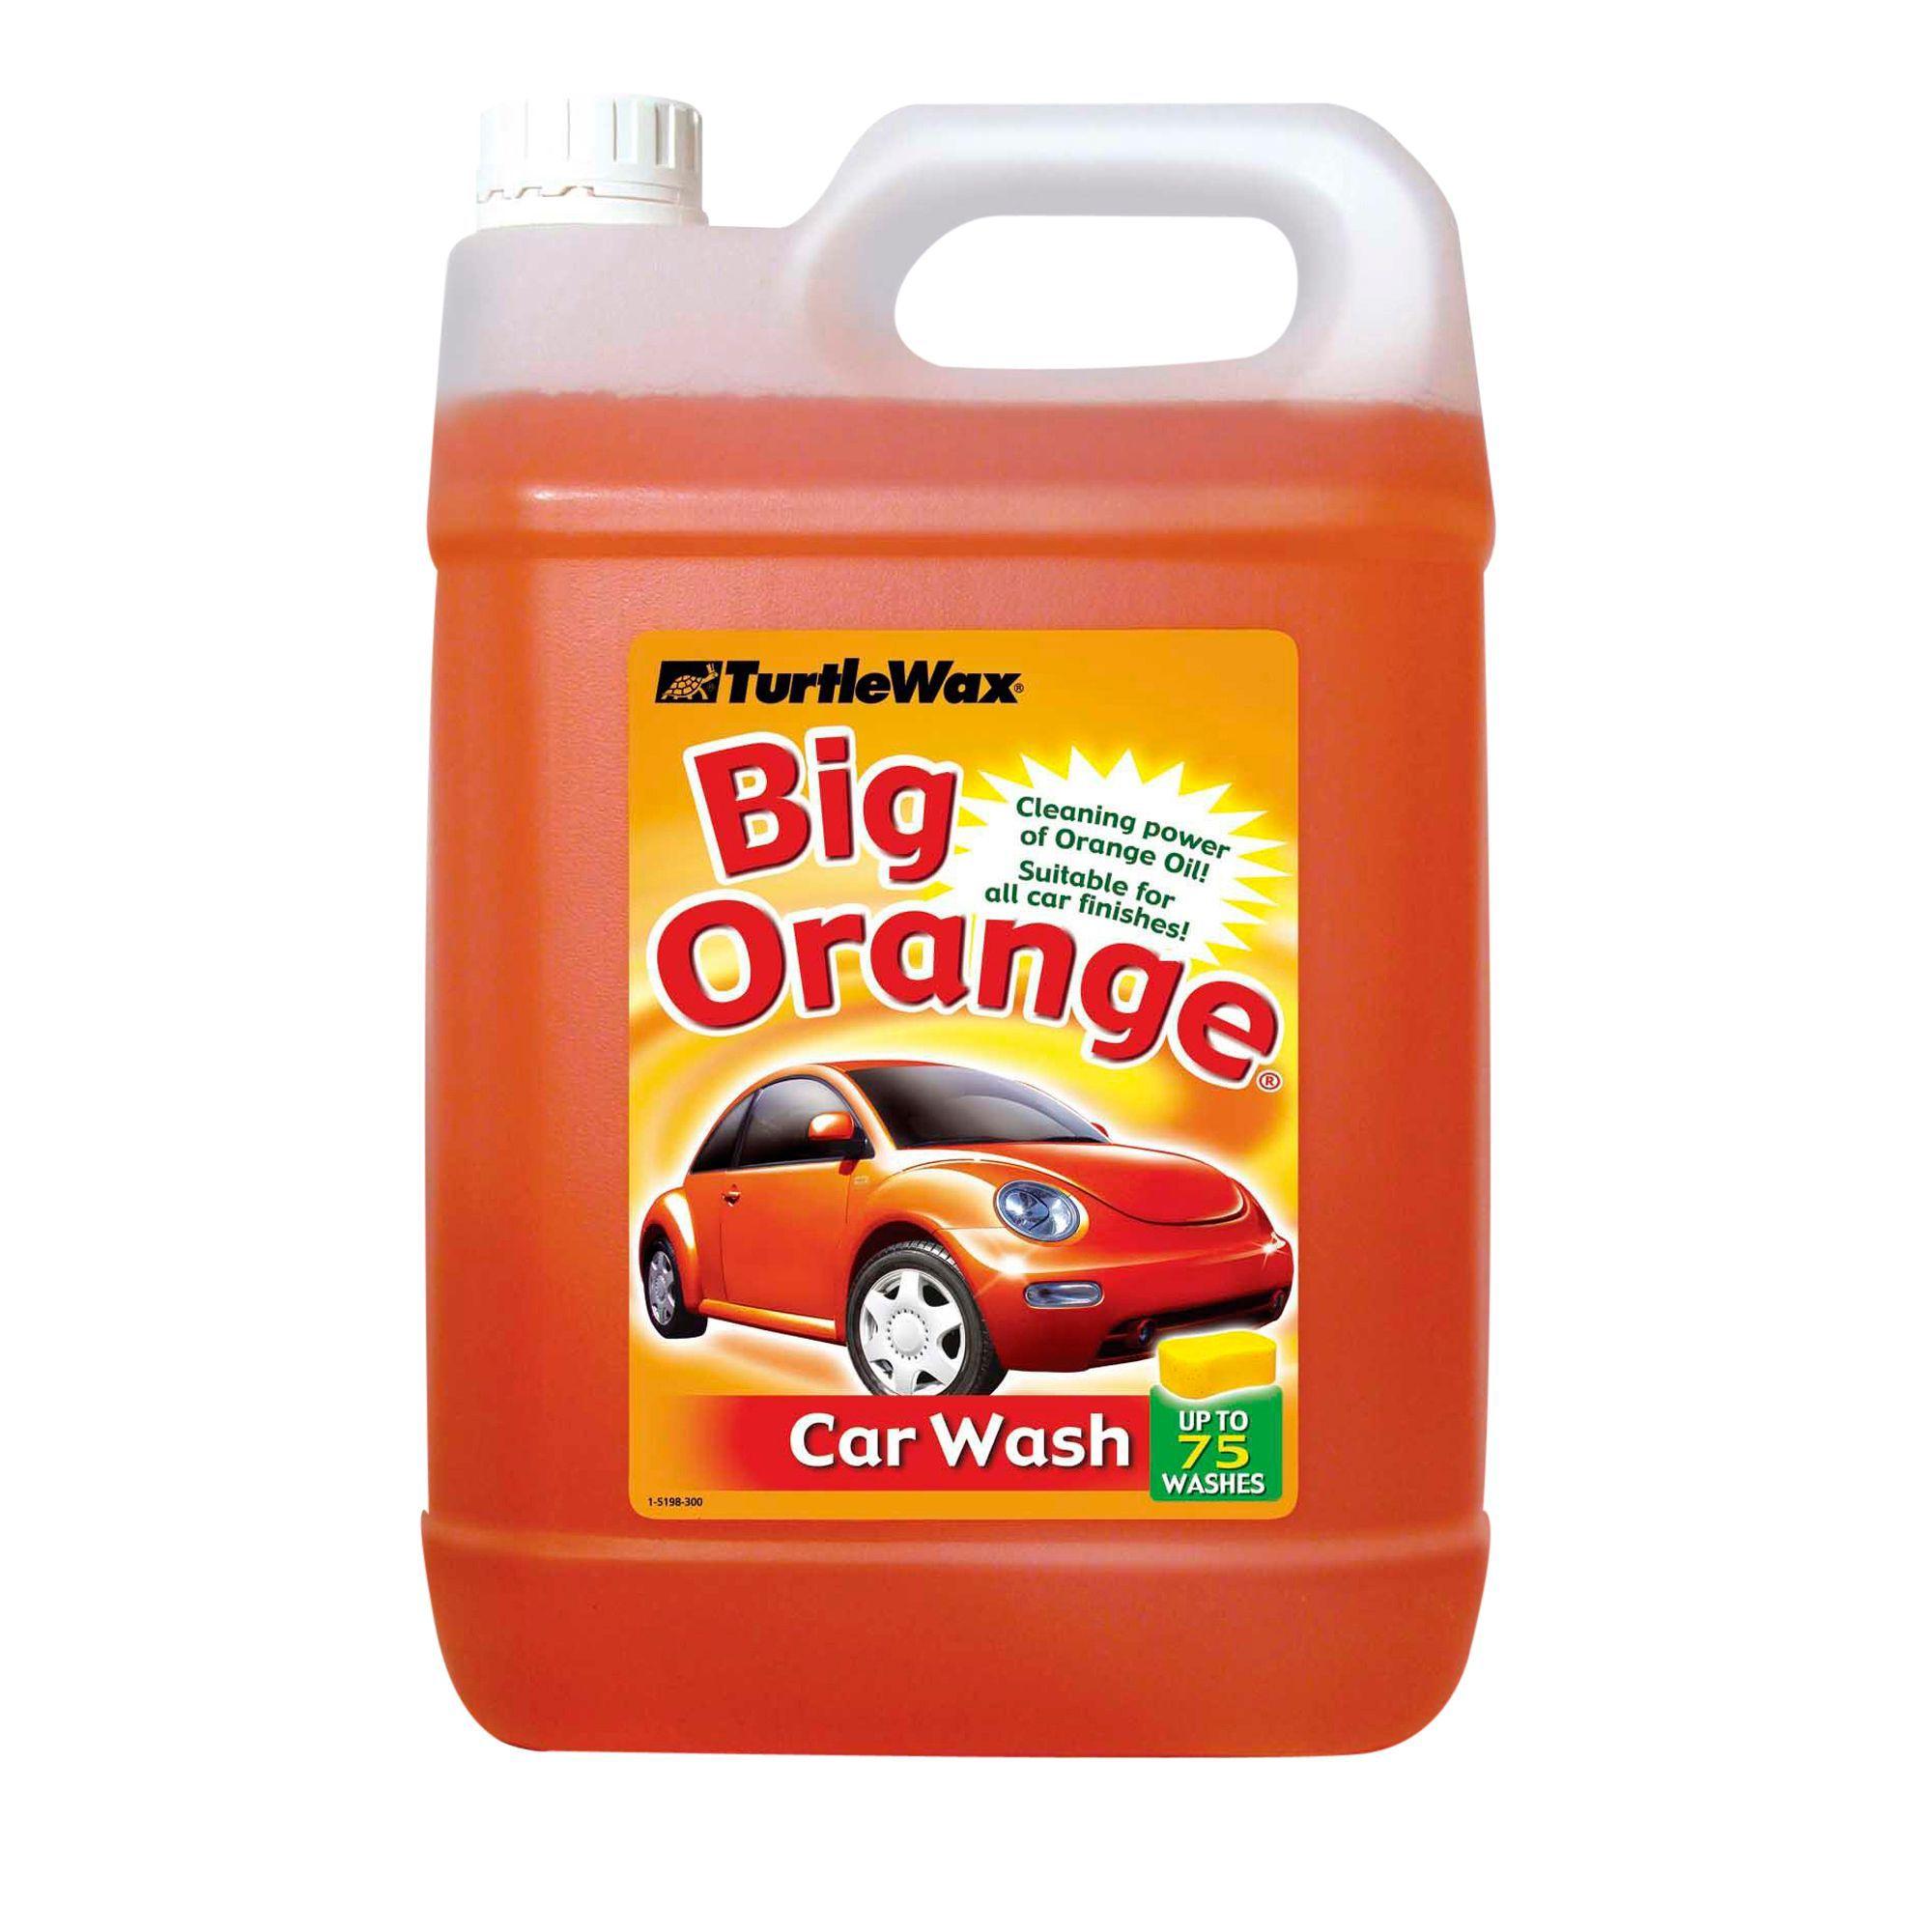 Harga Meguiars Gold Class Shampo Amp Conditioner 473 Ml Termurah G7164 Car Wash Mobil 6 Btl Jual Shampoo Turtle Wax Detailing